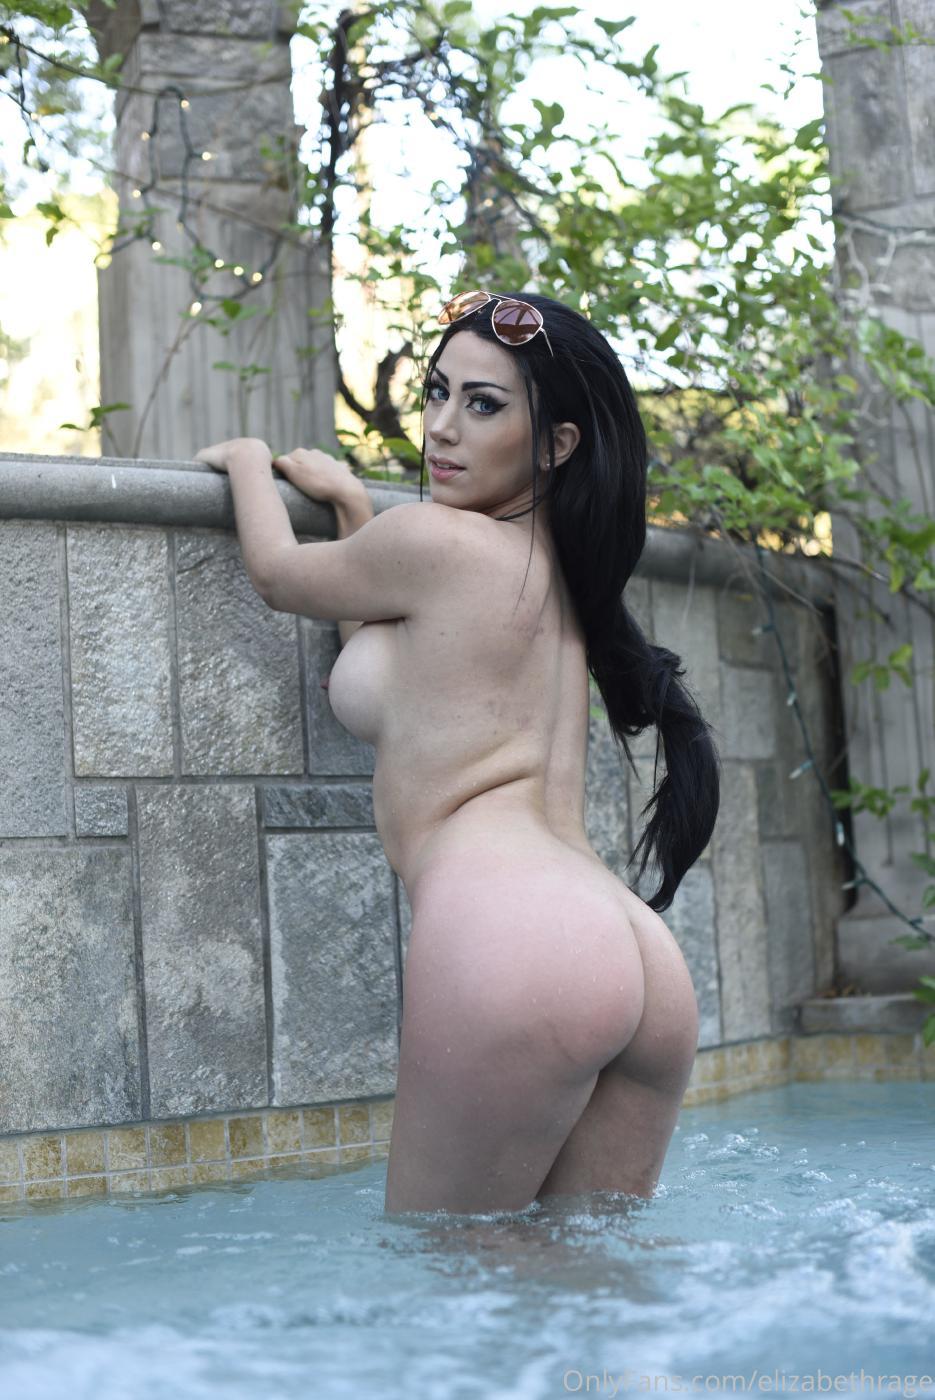 Elizabeth Rage Nude Outdoor Pool Onlyfans Set Leaked 0021